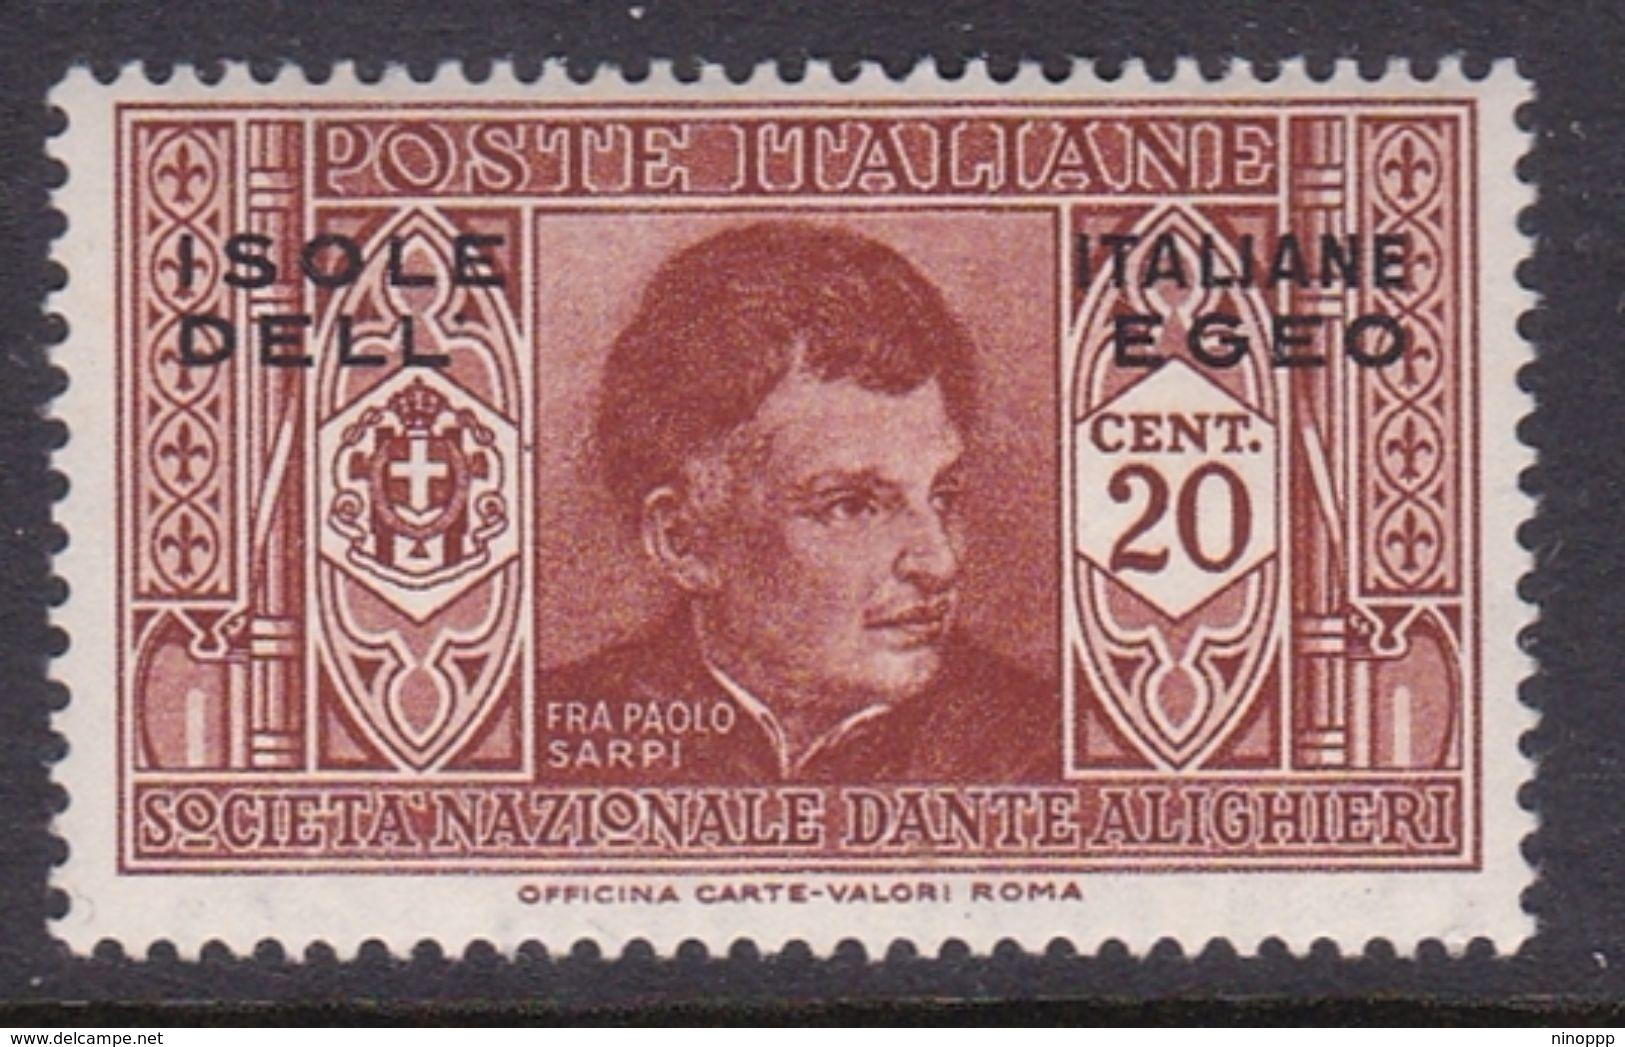 Italy-Colonies And Territories-Aegean General Issue-Rodi S46 1932 Dante Alighieri 20c Brown Orange MH - Italy